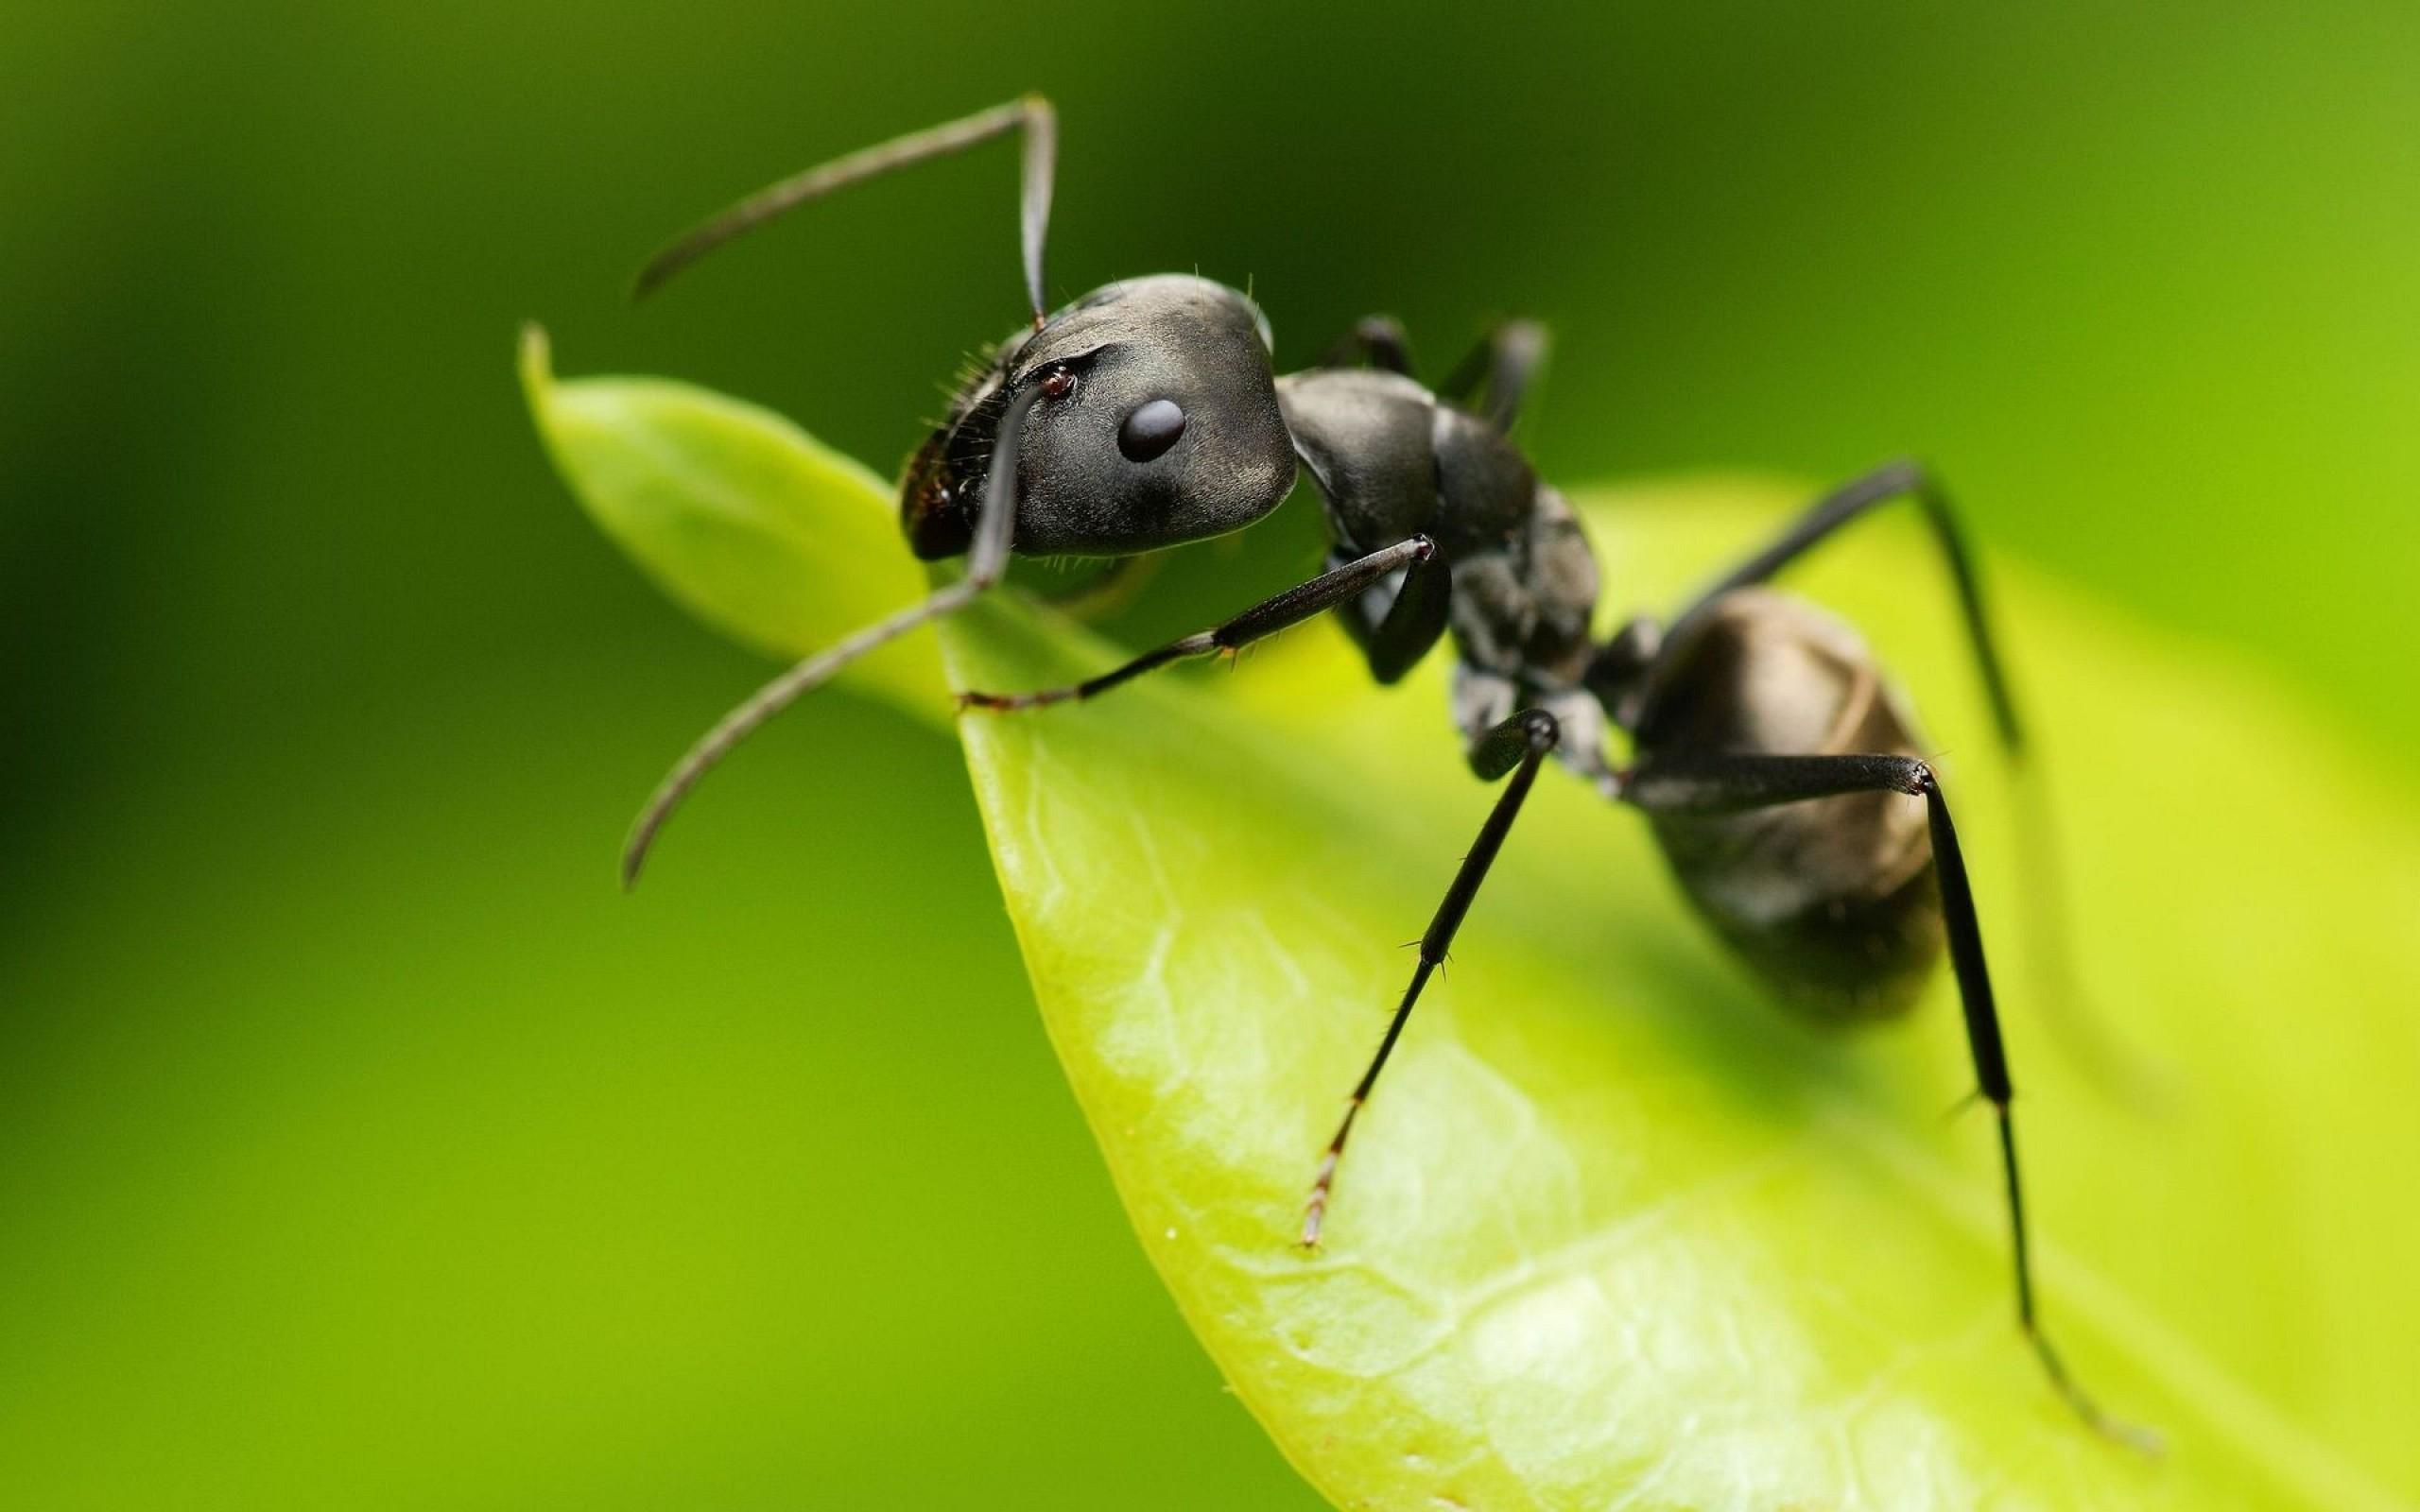 Ant, Awesome, Black, Image